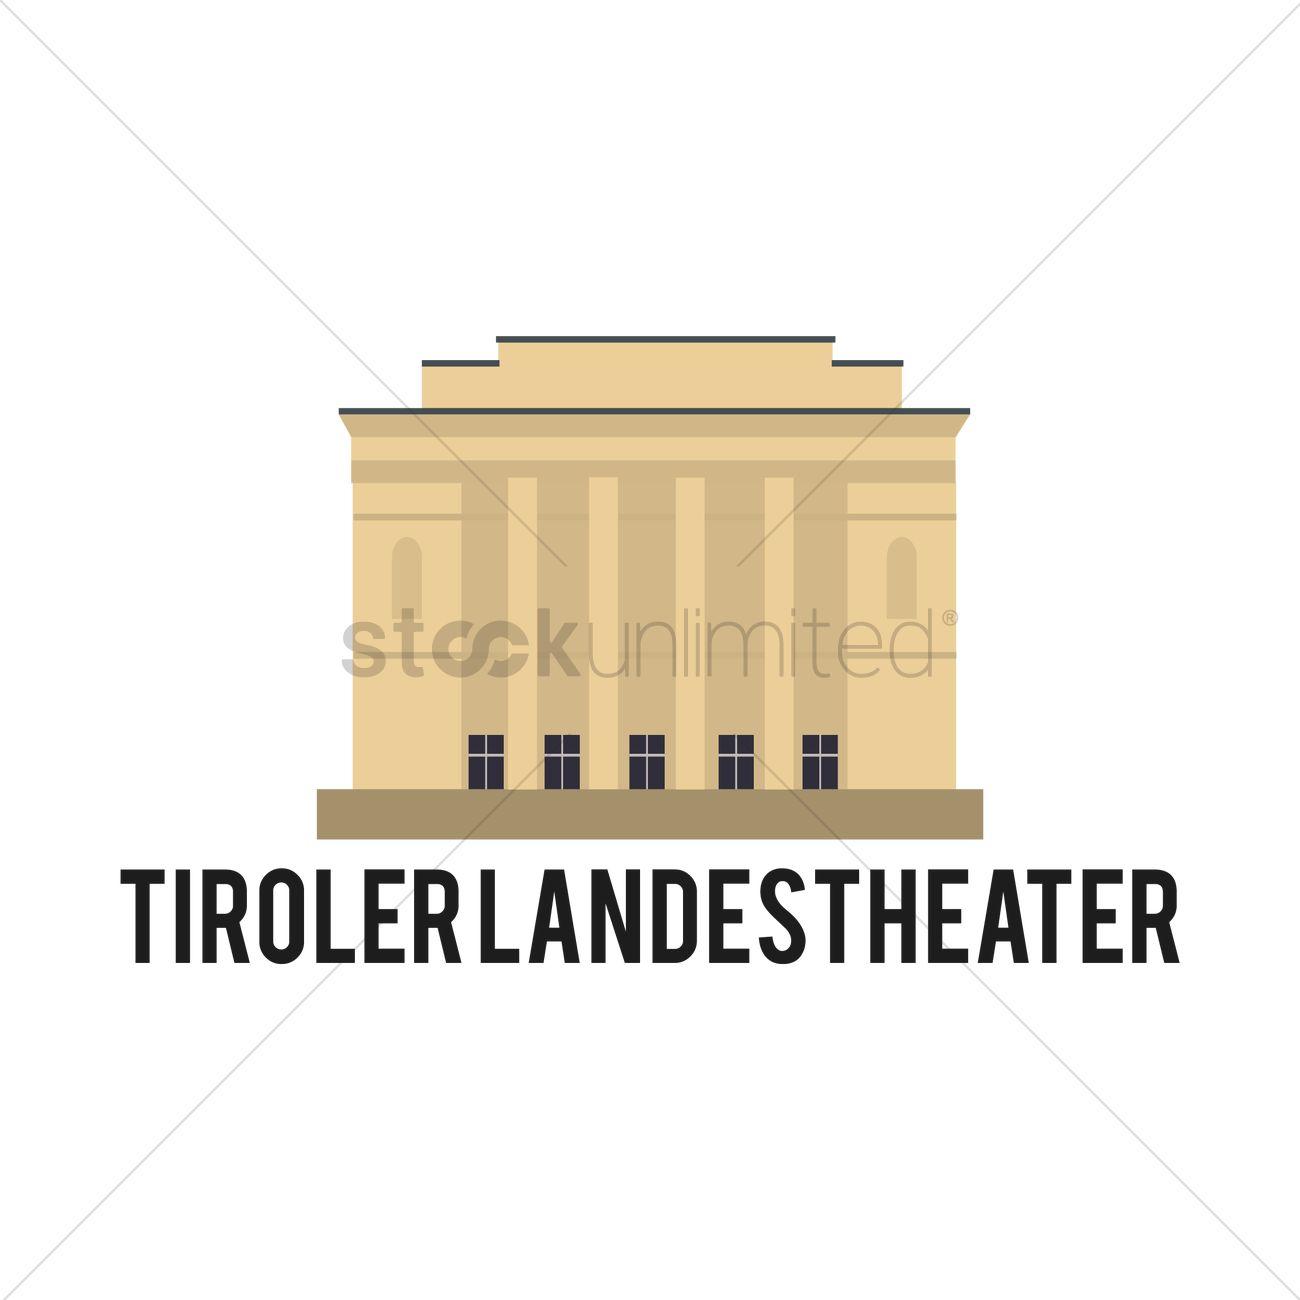 Tiroler landes theater Vector Image.